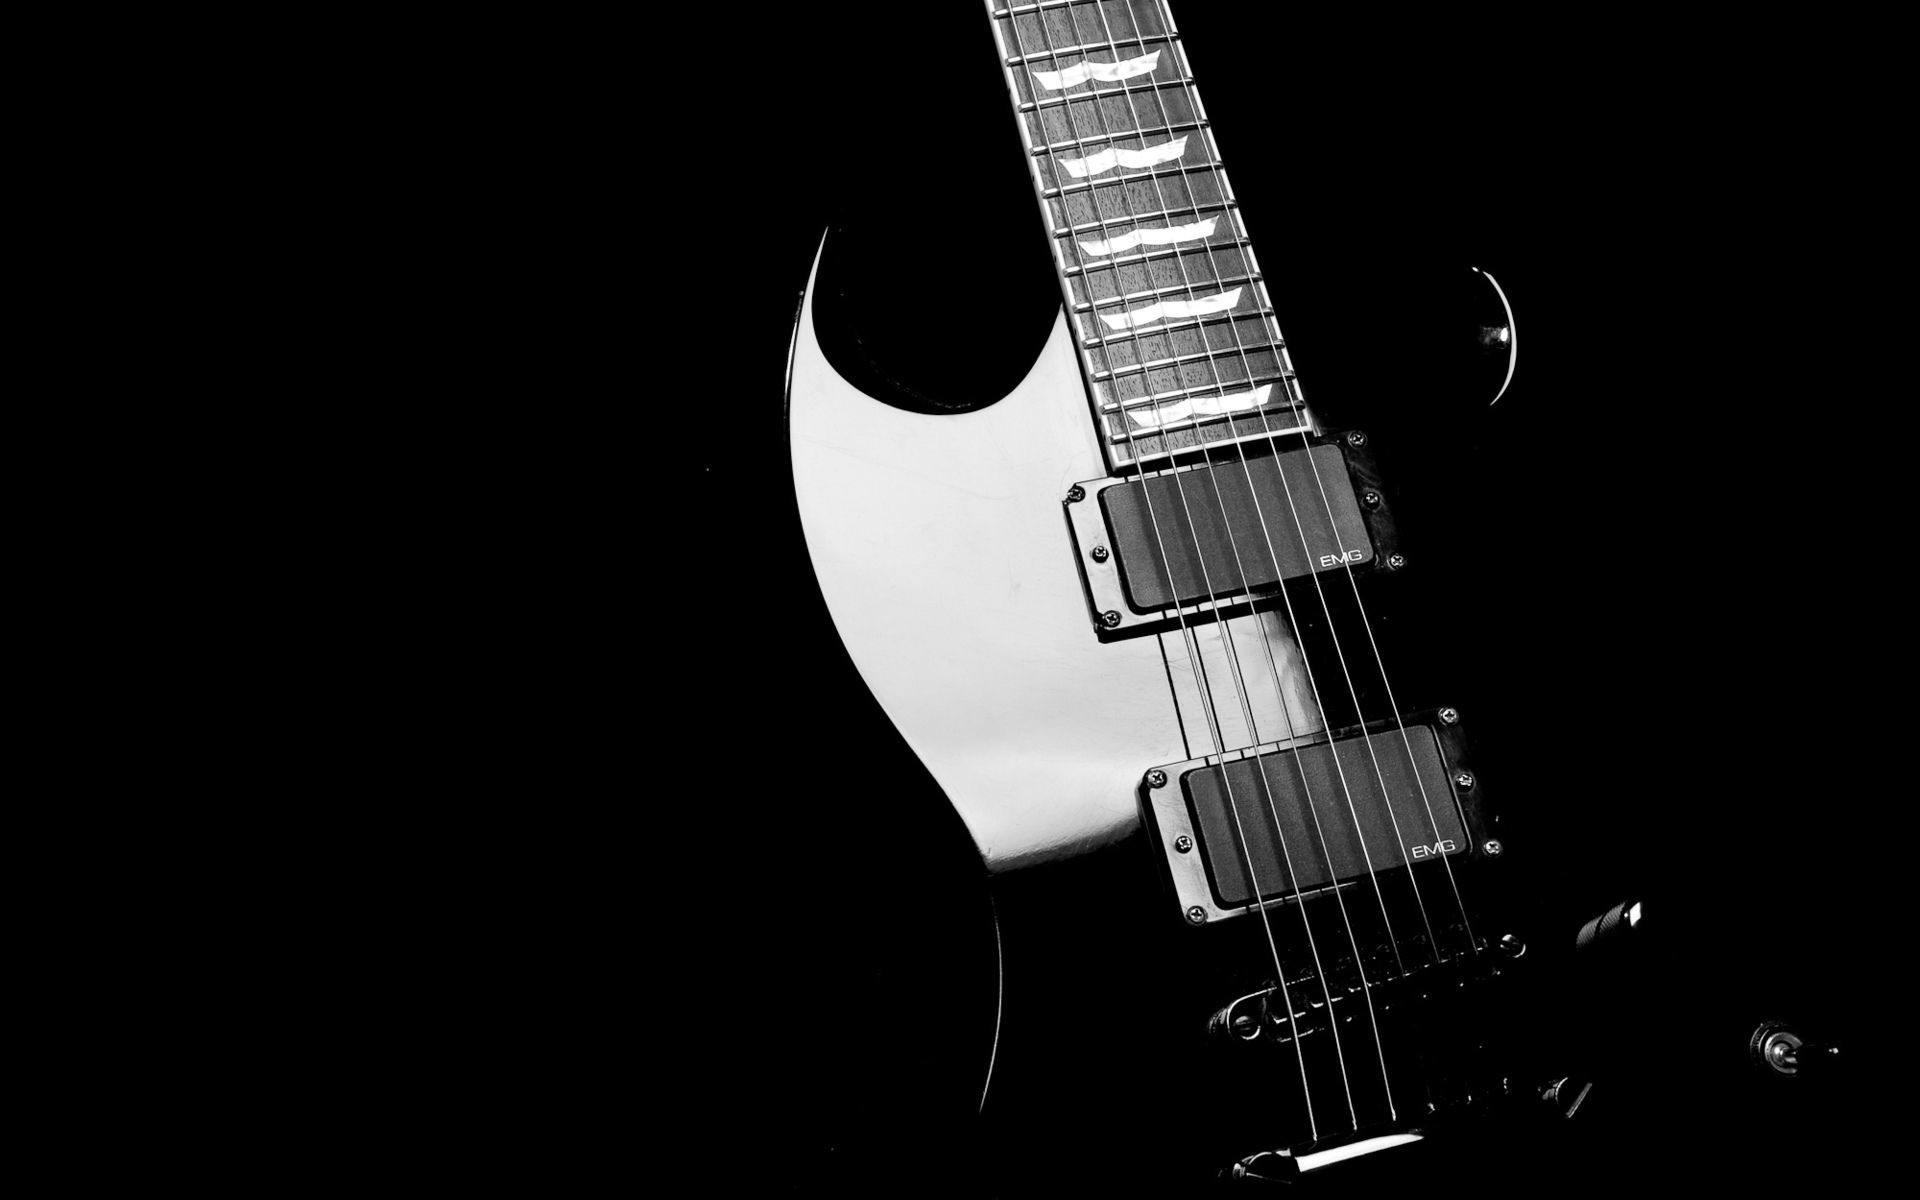 Guitar HD Wallpapers Backgrounds Wallpaper Wallpapers Of Guitars Wallpapers)